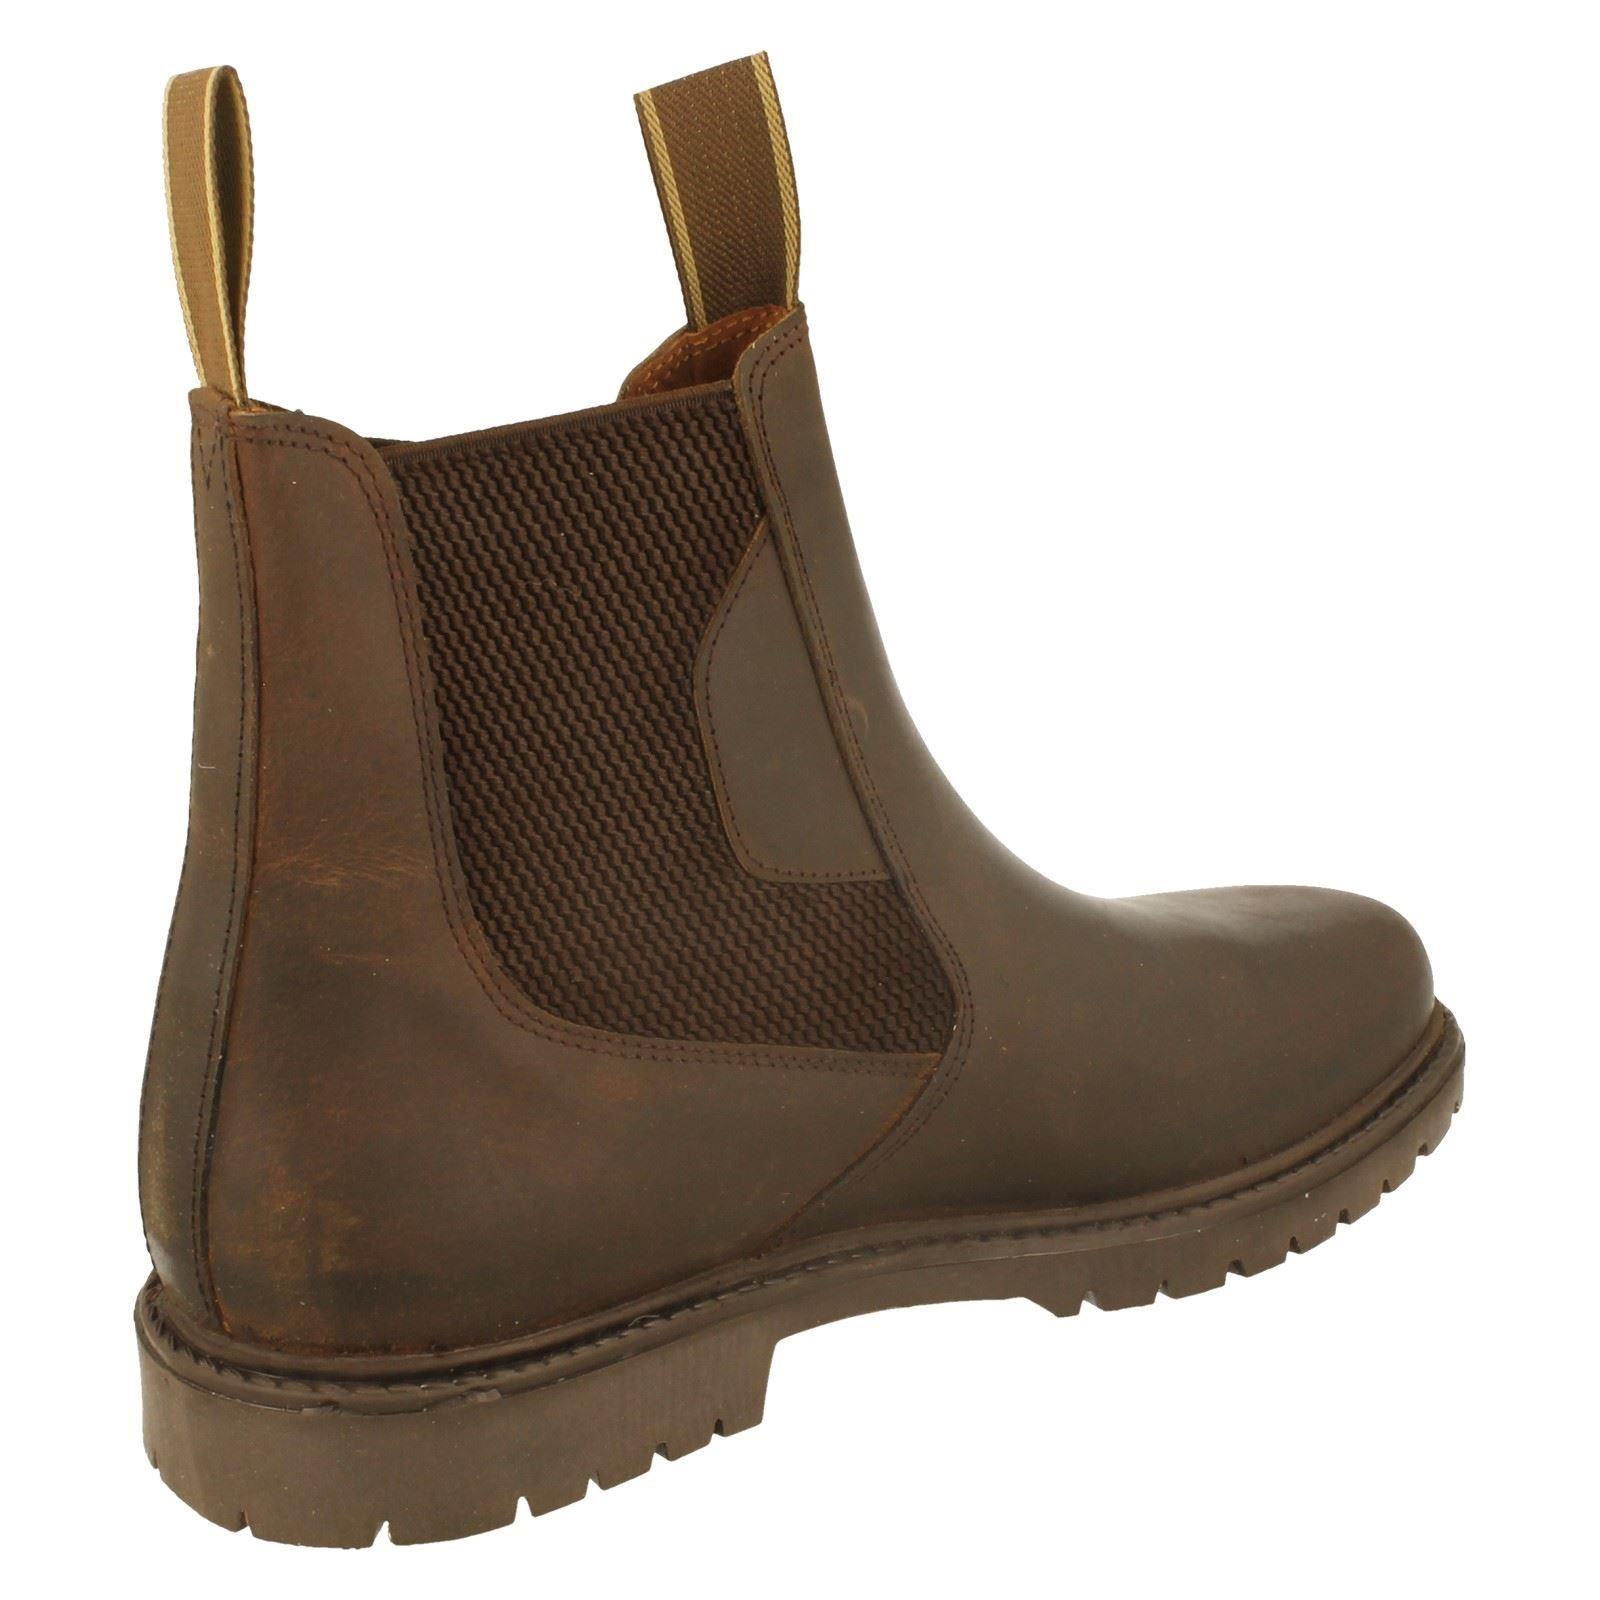 Hombre Taurus botas botas botas Style Dealer-W 2fd967